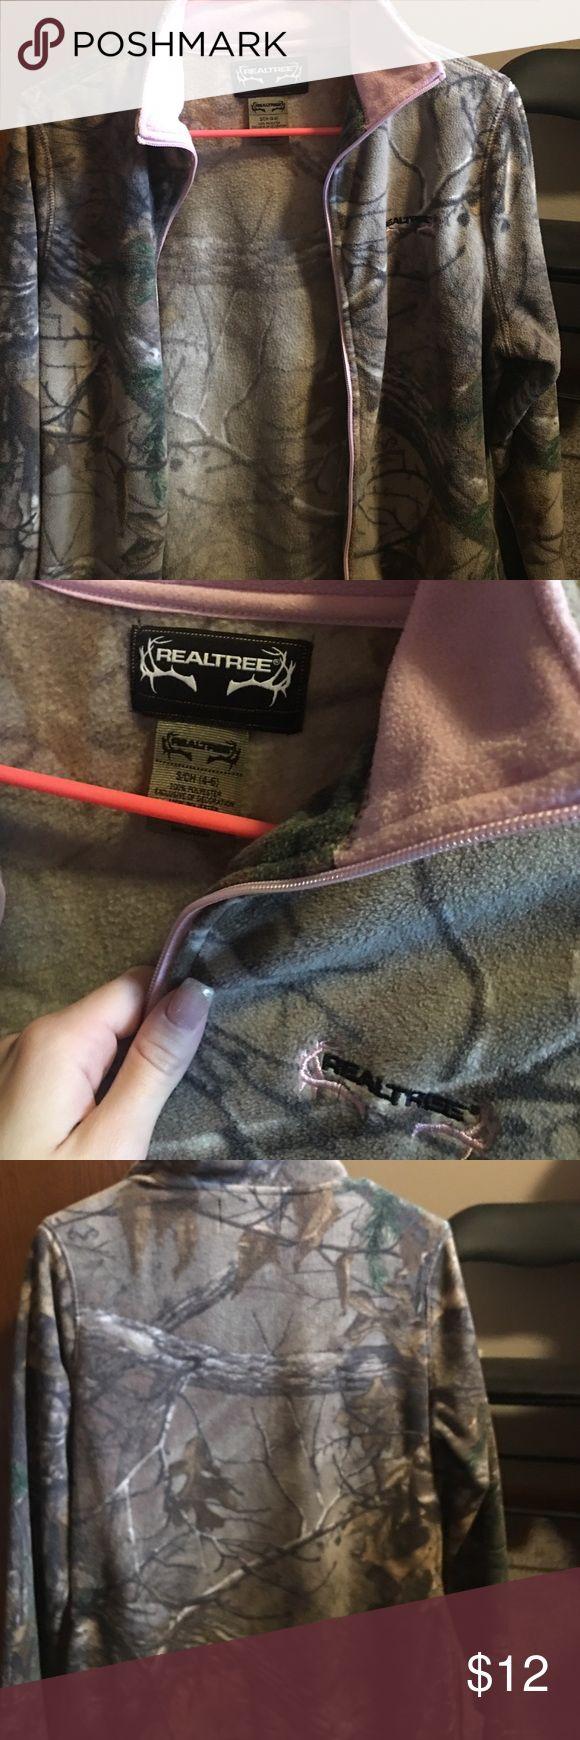 Real tree camo jacket size small Really tree camo jacket size small worn once in great condition has light pink on the zipper line and collar real tree Jackets & Coats